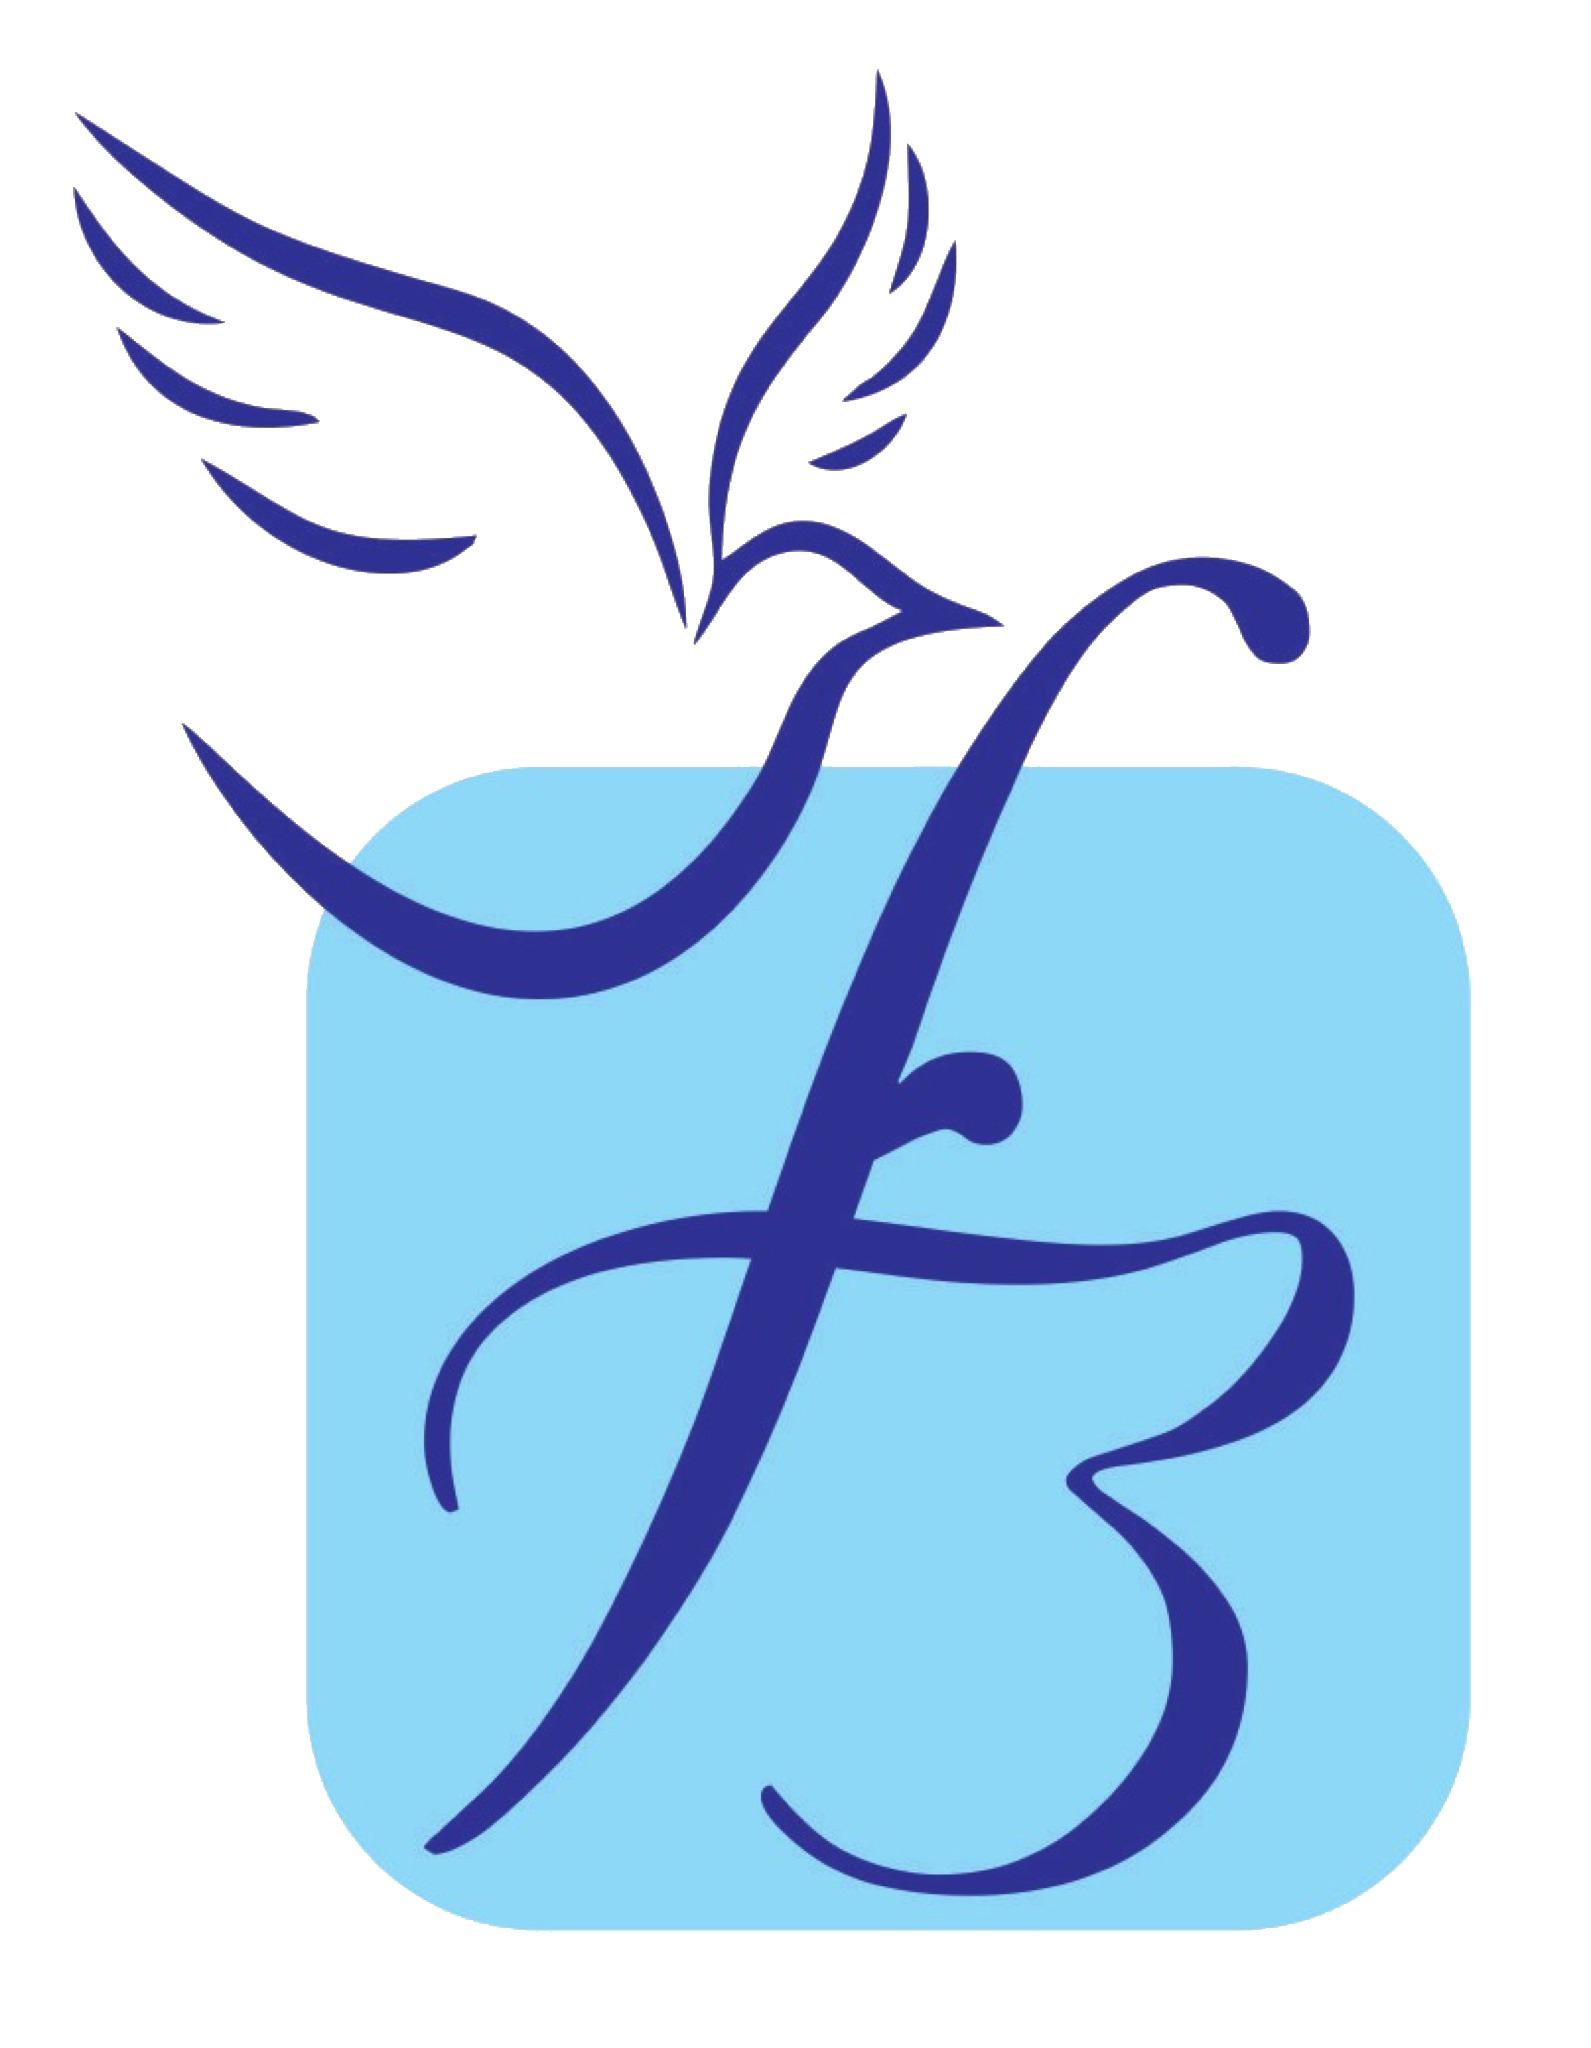 Freebird Imf